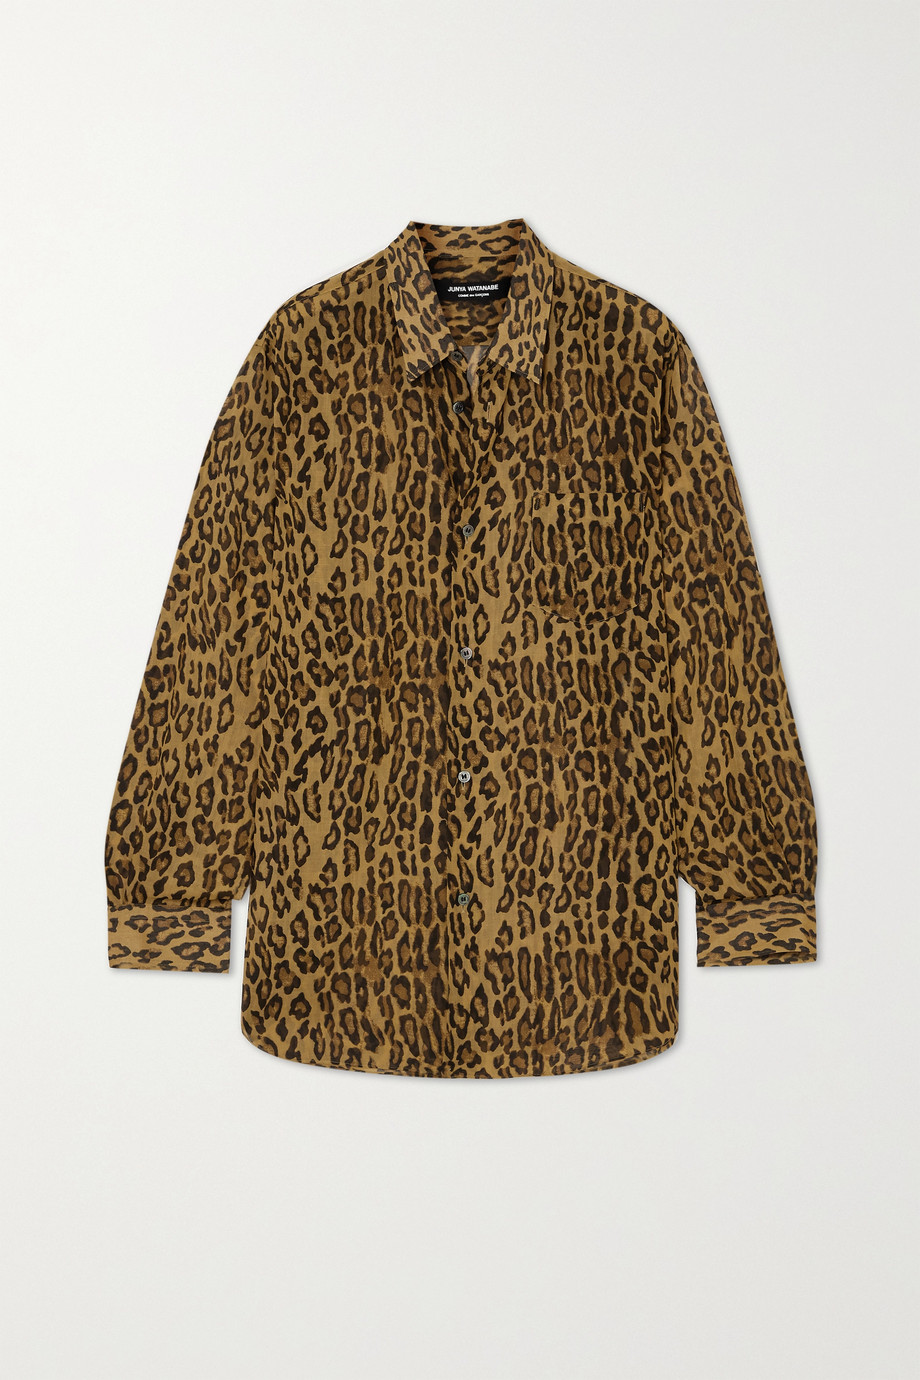 Junya Watanabe 豹纹巴里纱衬衫